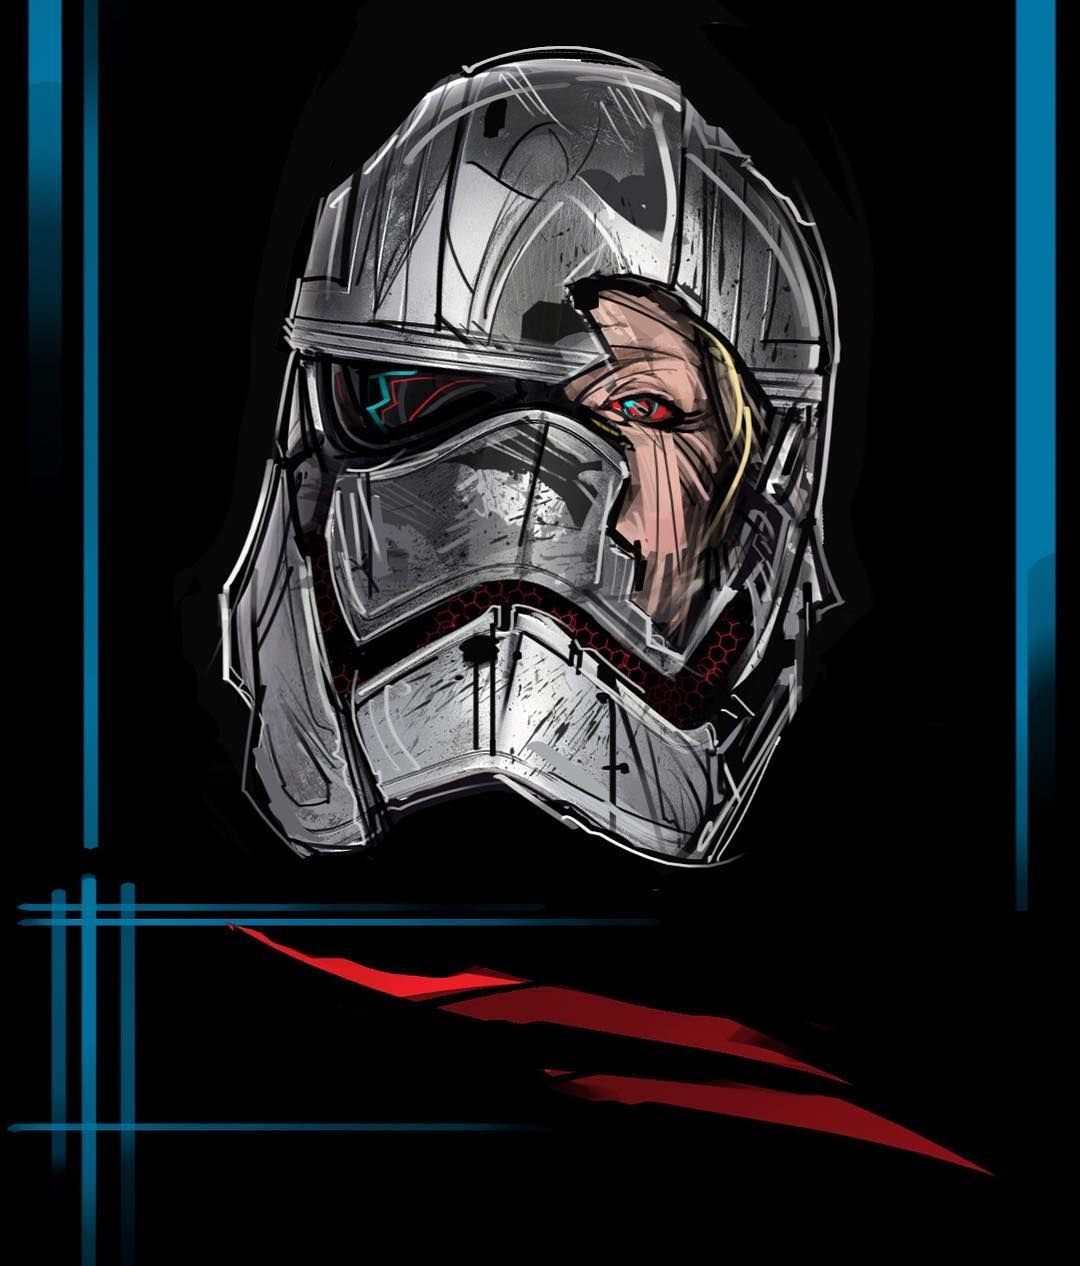 Captain Phasma Star Wars Star Wars Canon Star Wars Fandom Star Wars Trooper